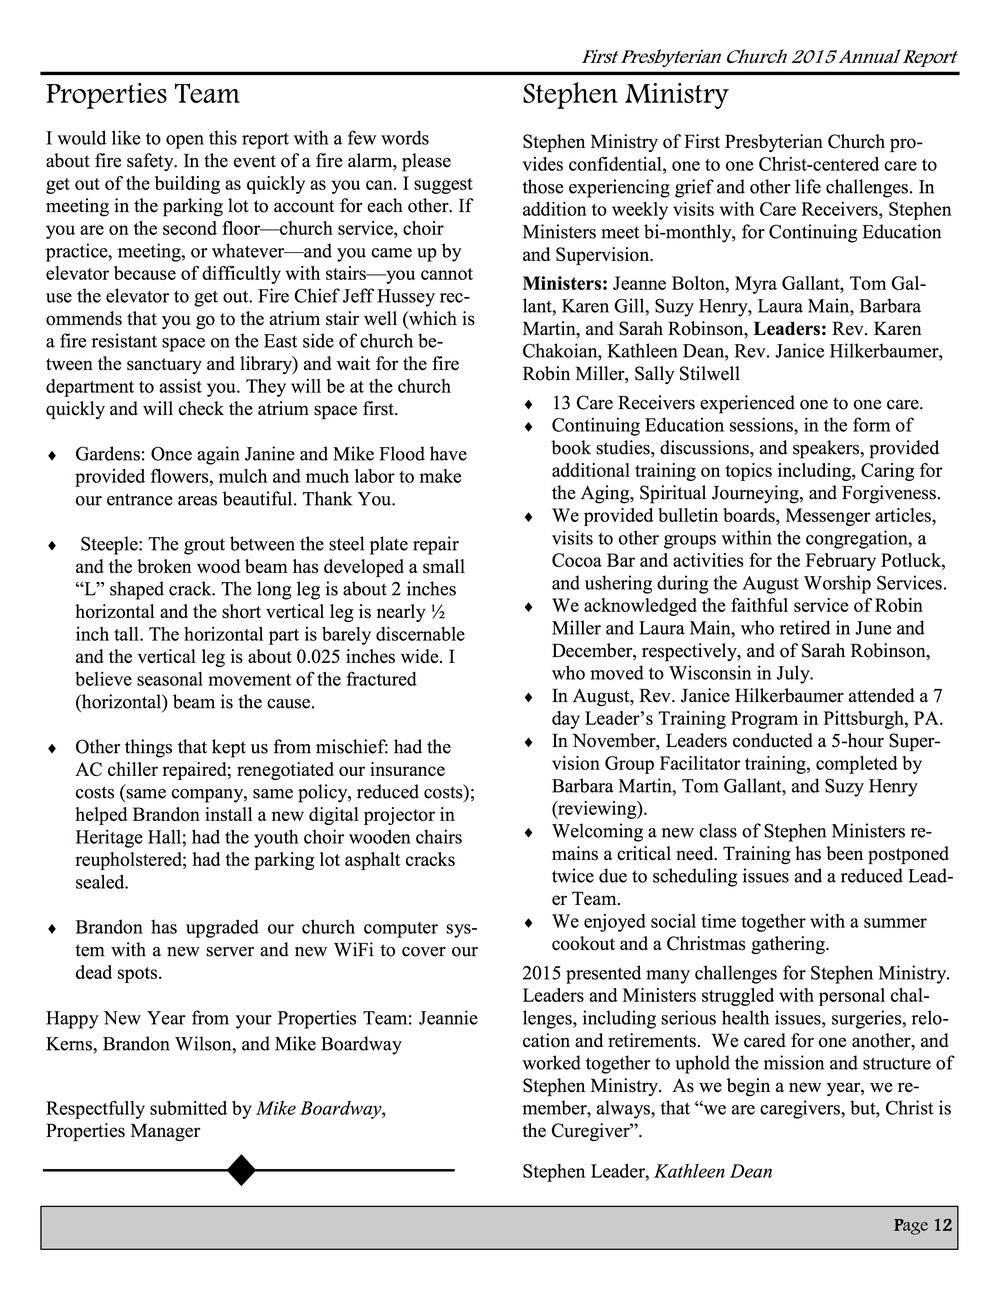 2015 Annual Report - 12.jpg